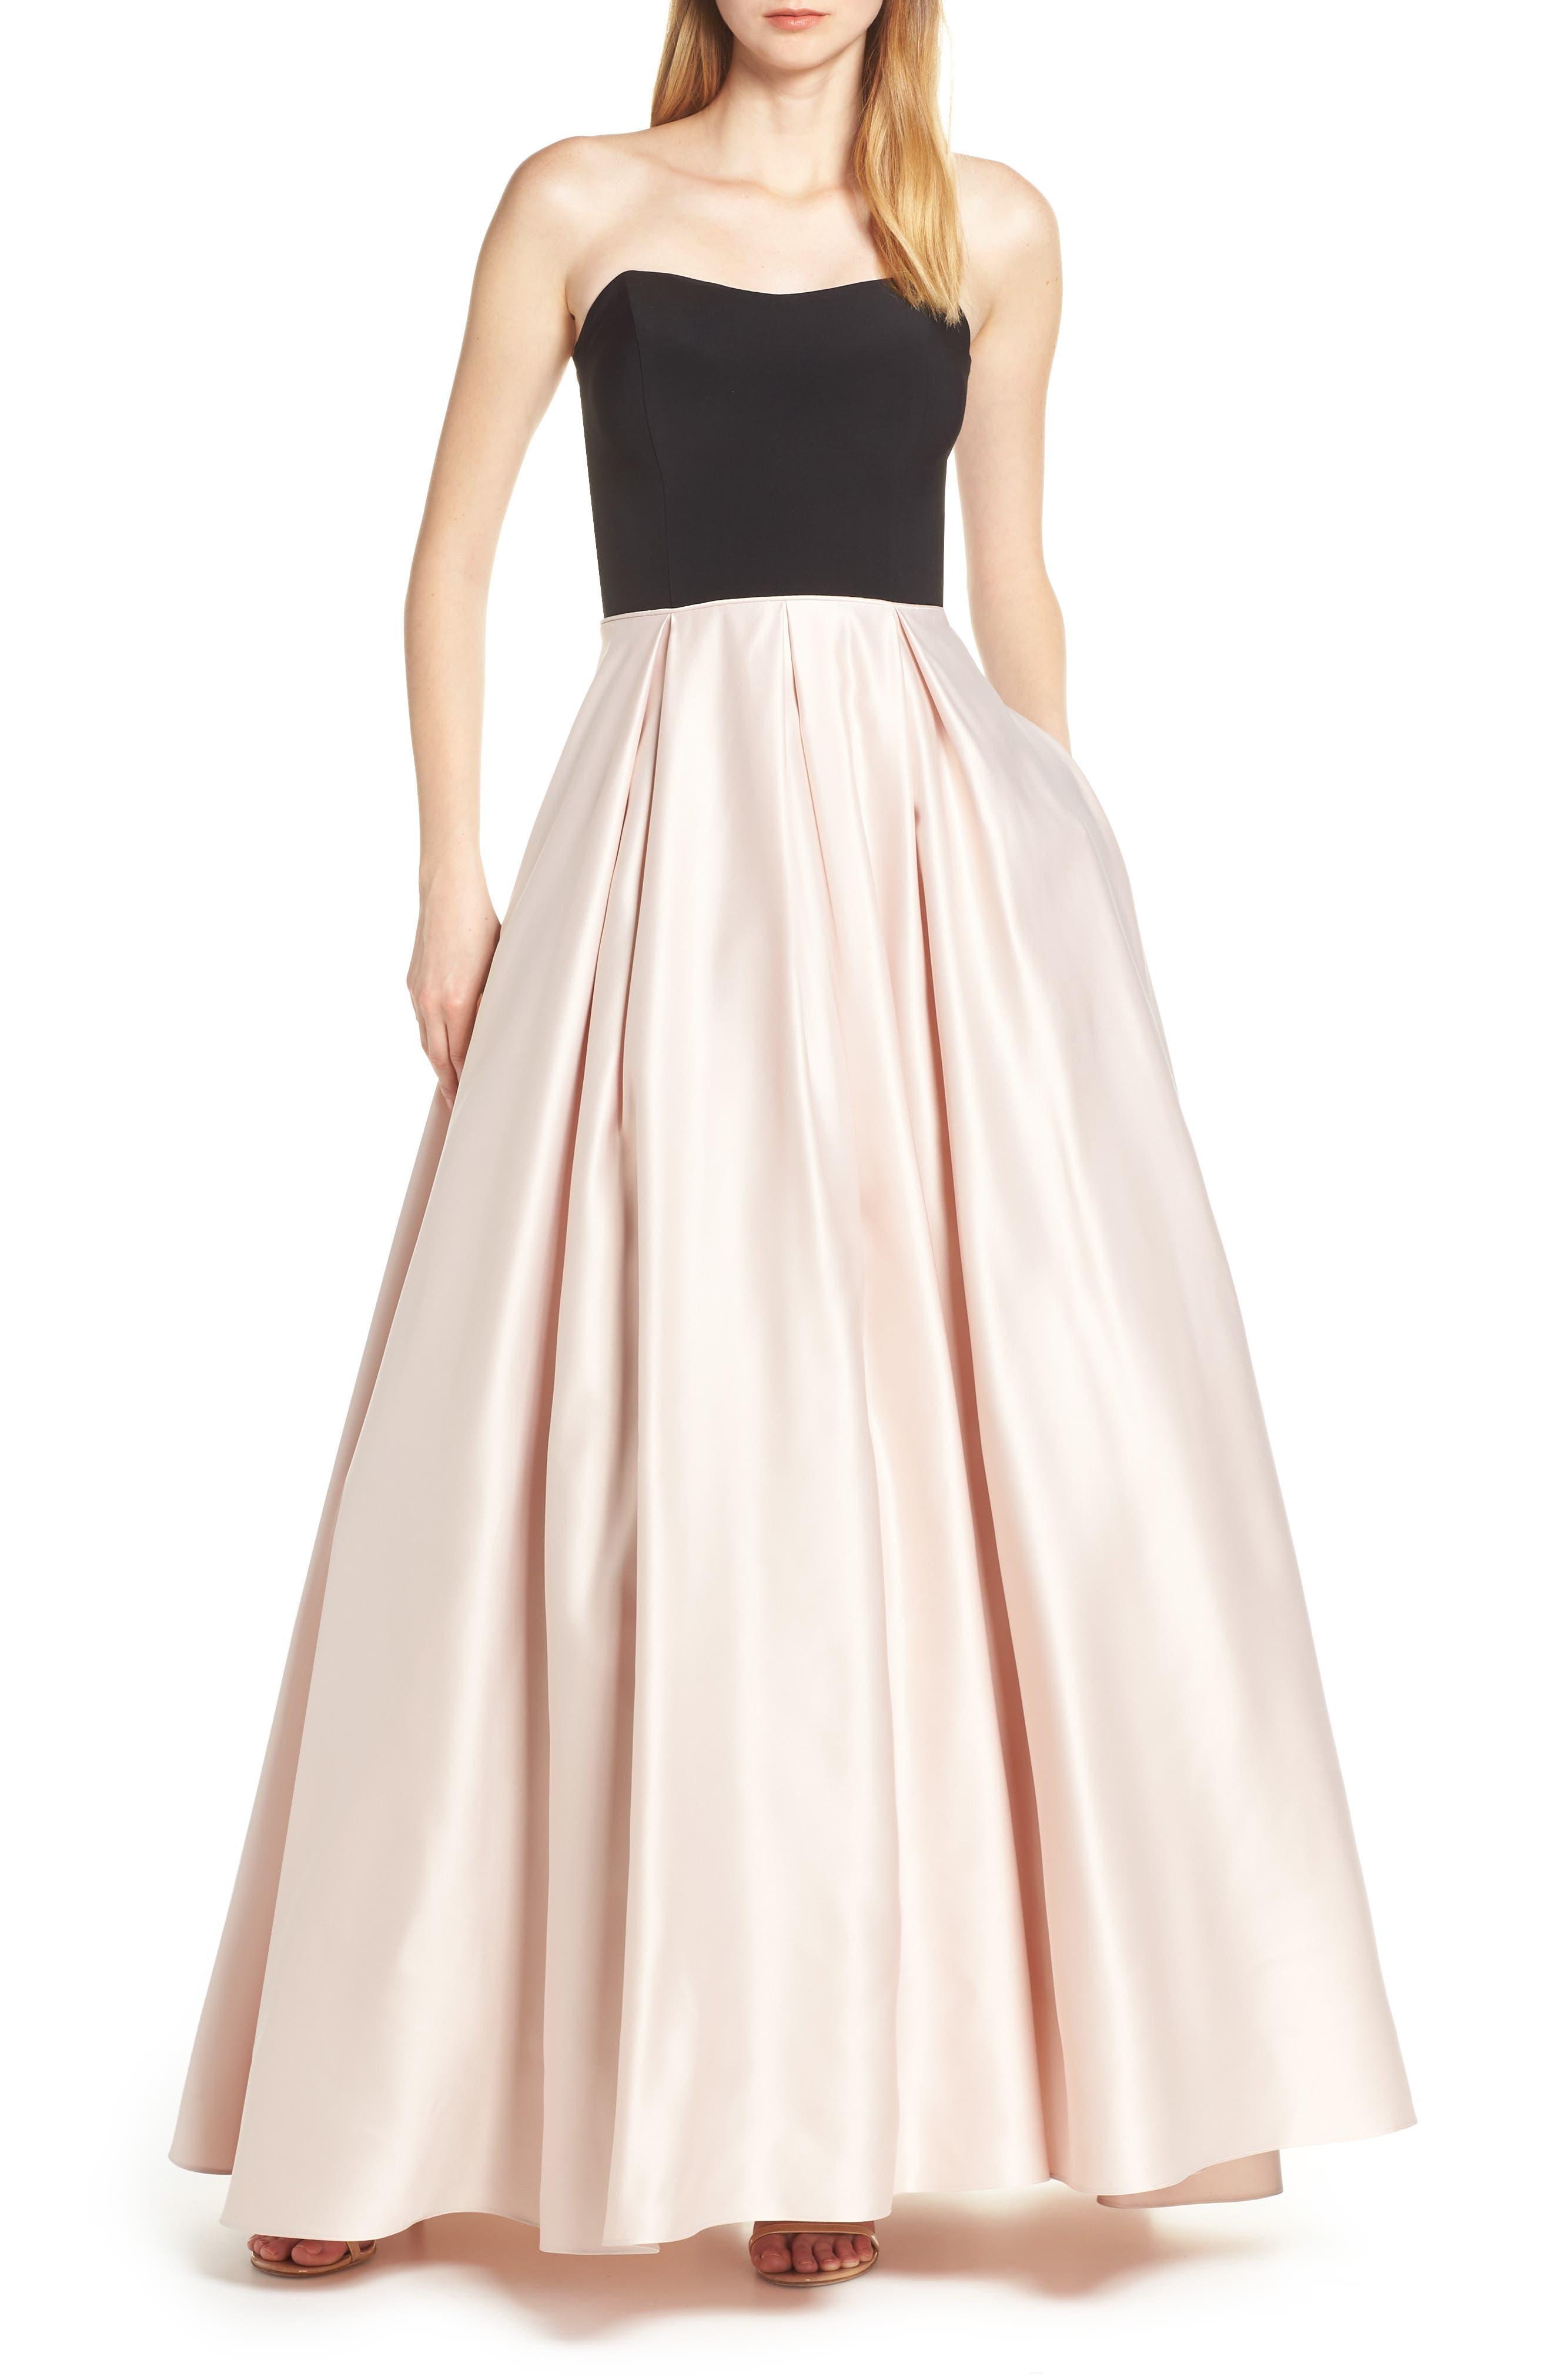 Blondie Nites Strapless Satin Skirt Evening Dress